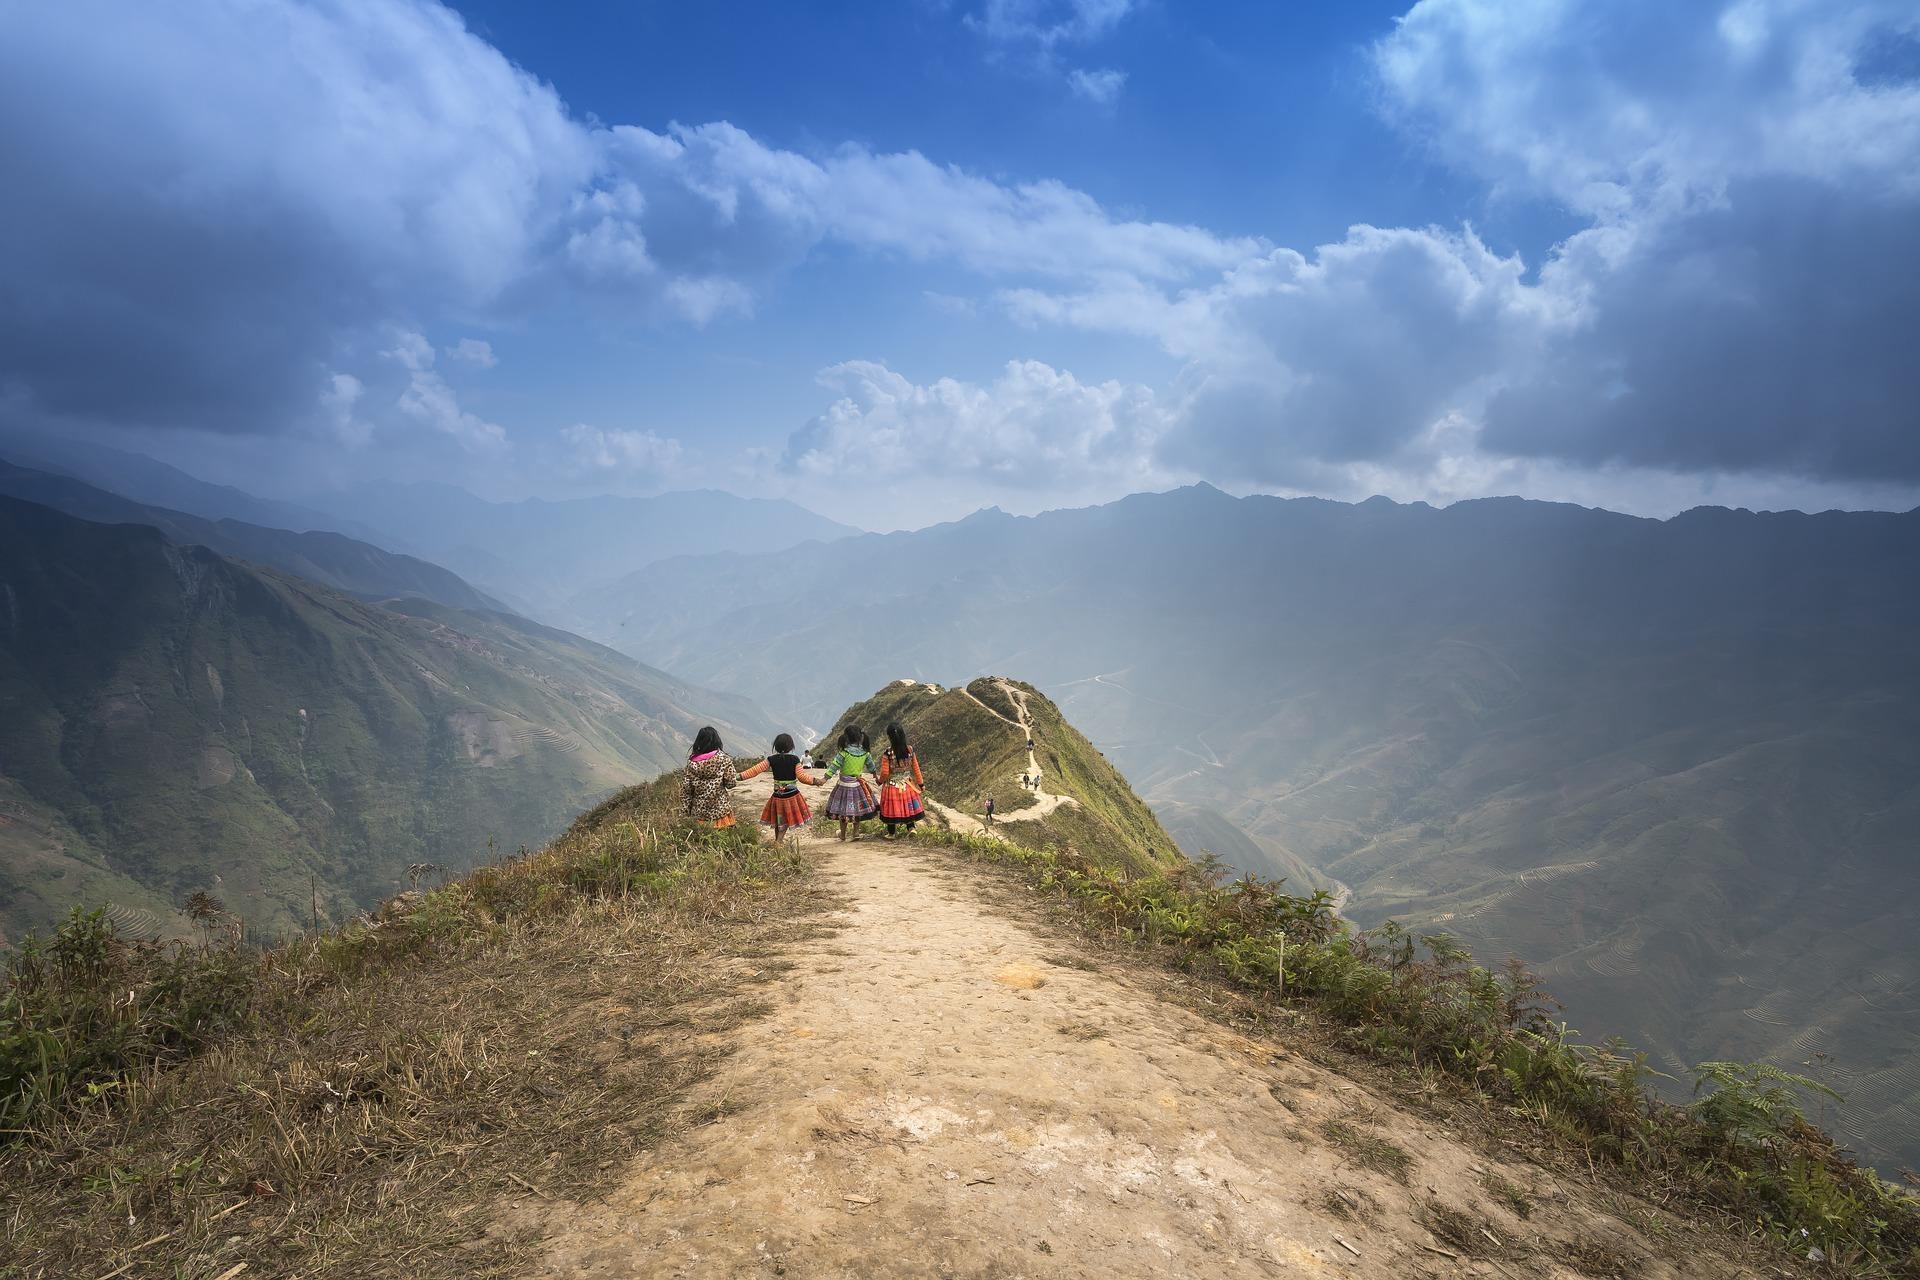 Góry, Jeziora i Lasy na terenach Azji